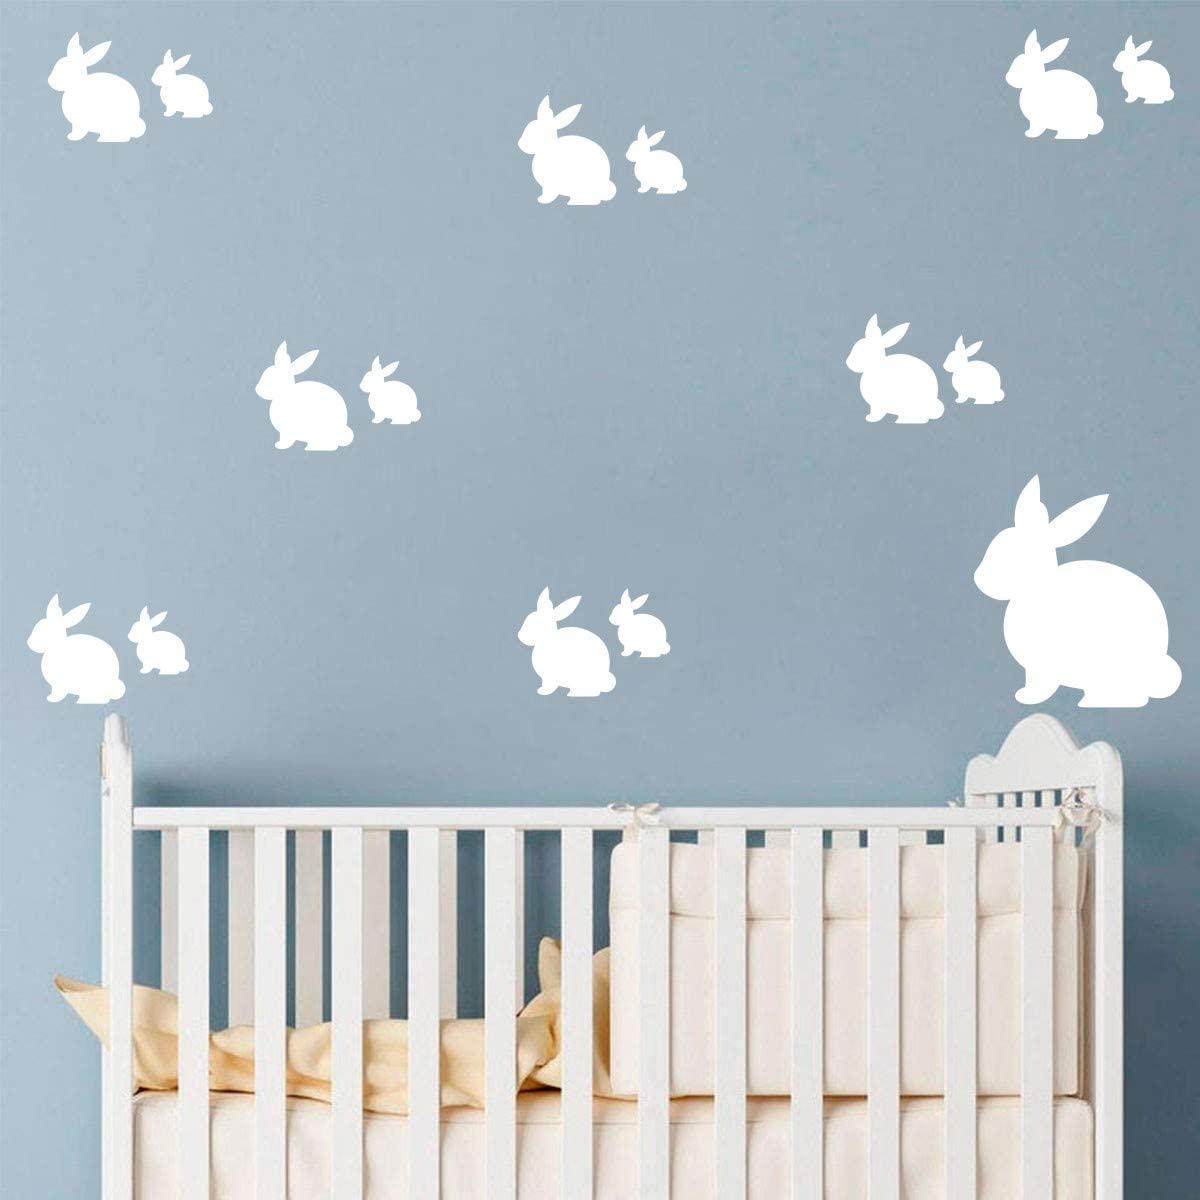 Makeyes Rabbit Animals Wall Stickers Girls Cute Rabbits Sheet Set Wall Decals Vinyl Kids Bedroom Decoration Wall Decor Peel Stick DIY MG013 (White)